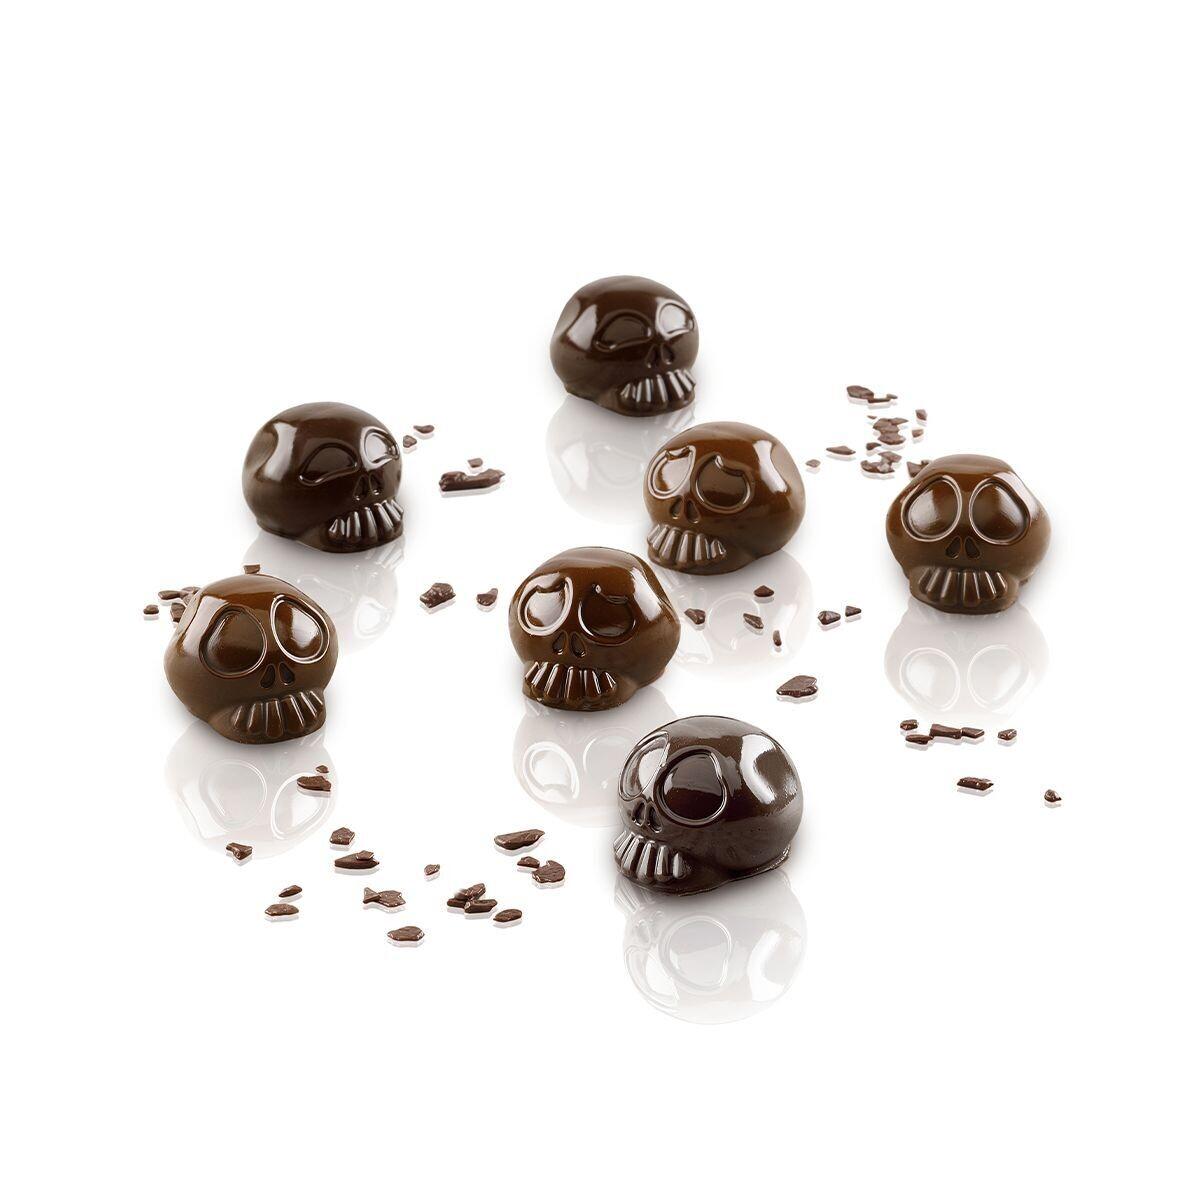 Silikomart Mould -SKULLS - Καλούπι Σιλικόνης για σοκολατάκια 'Κρανία'